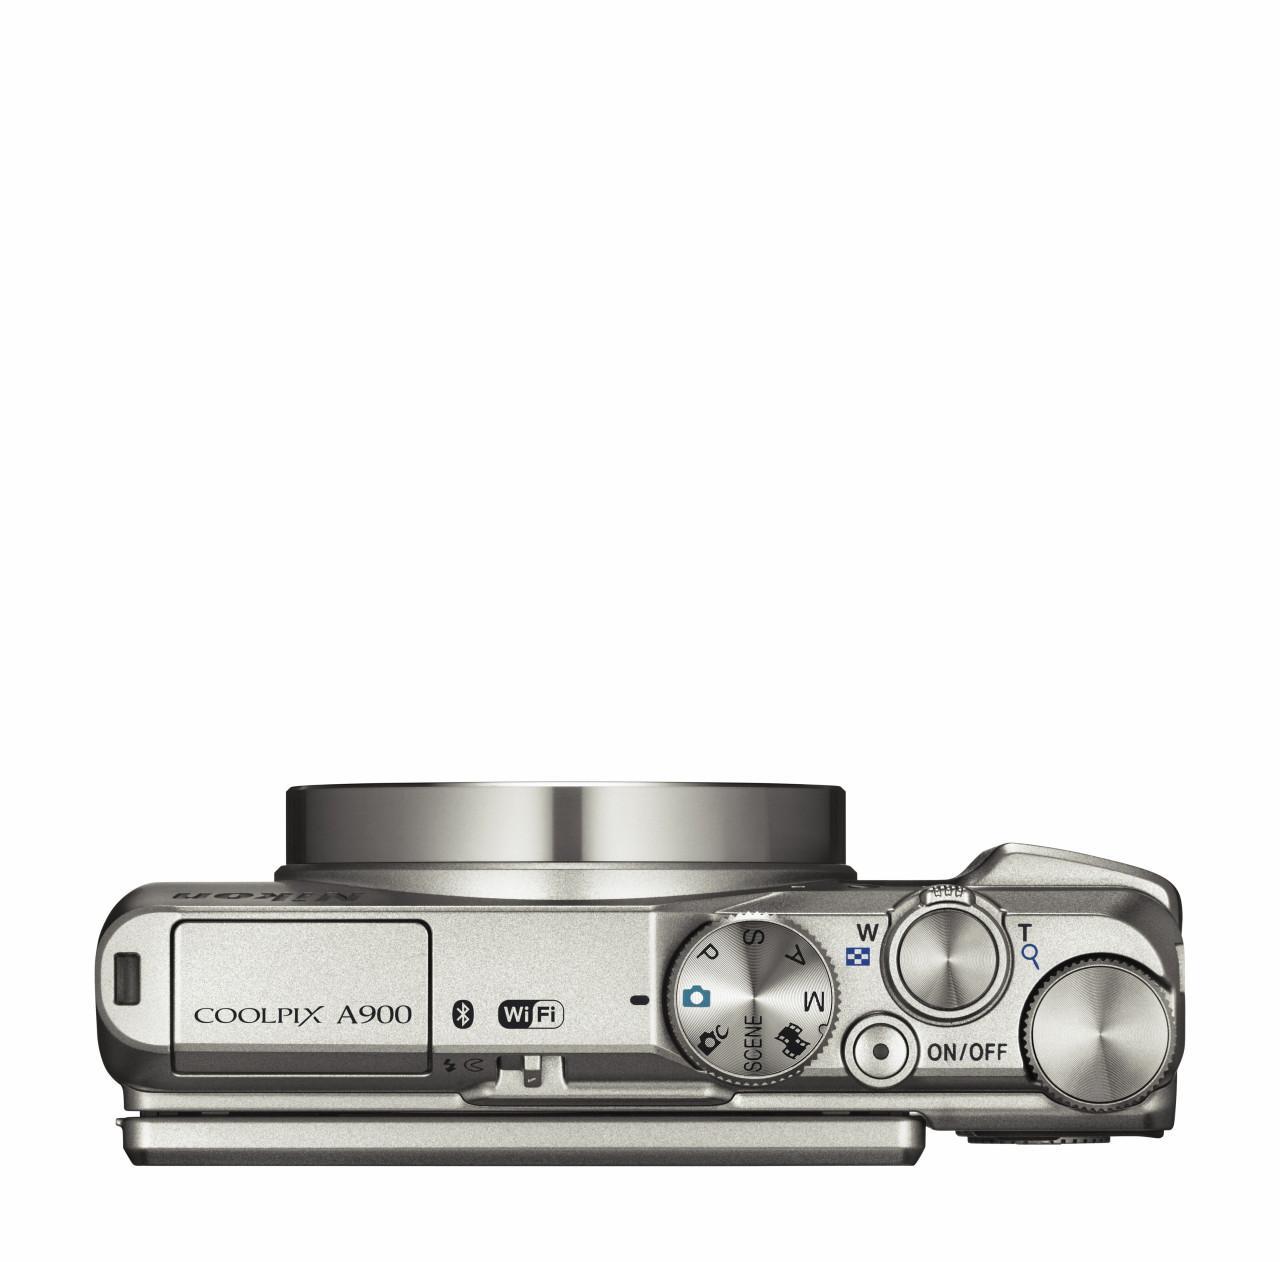 Nikon Long-Zoom COOLPIX cameras make short work of long